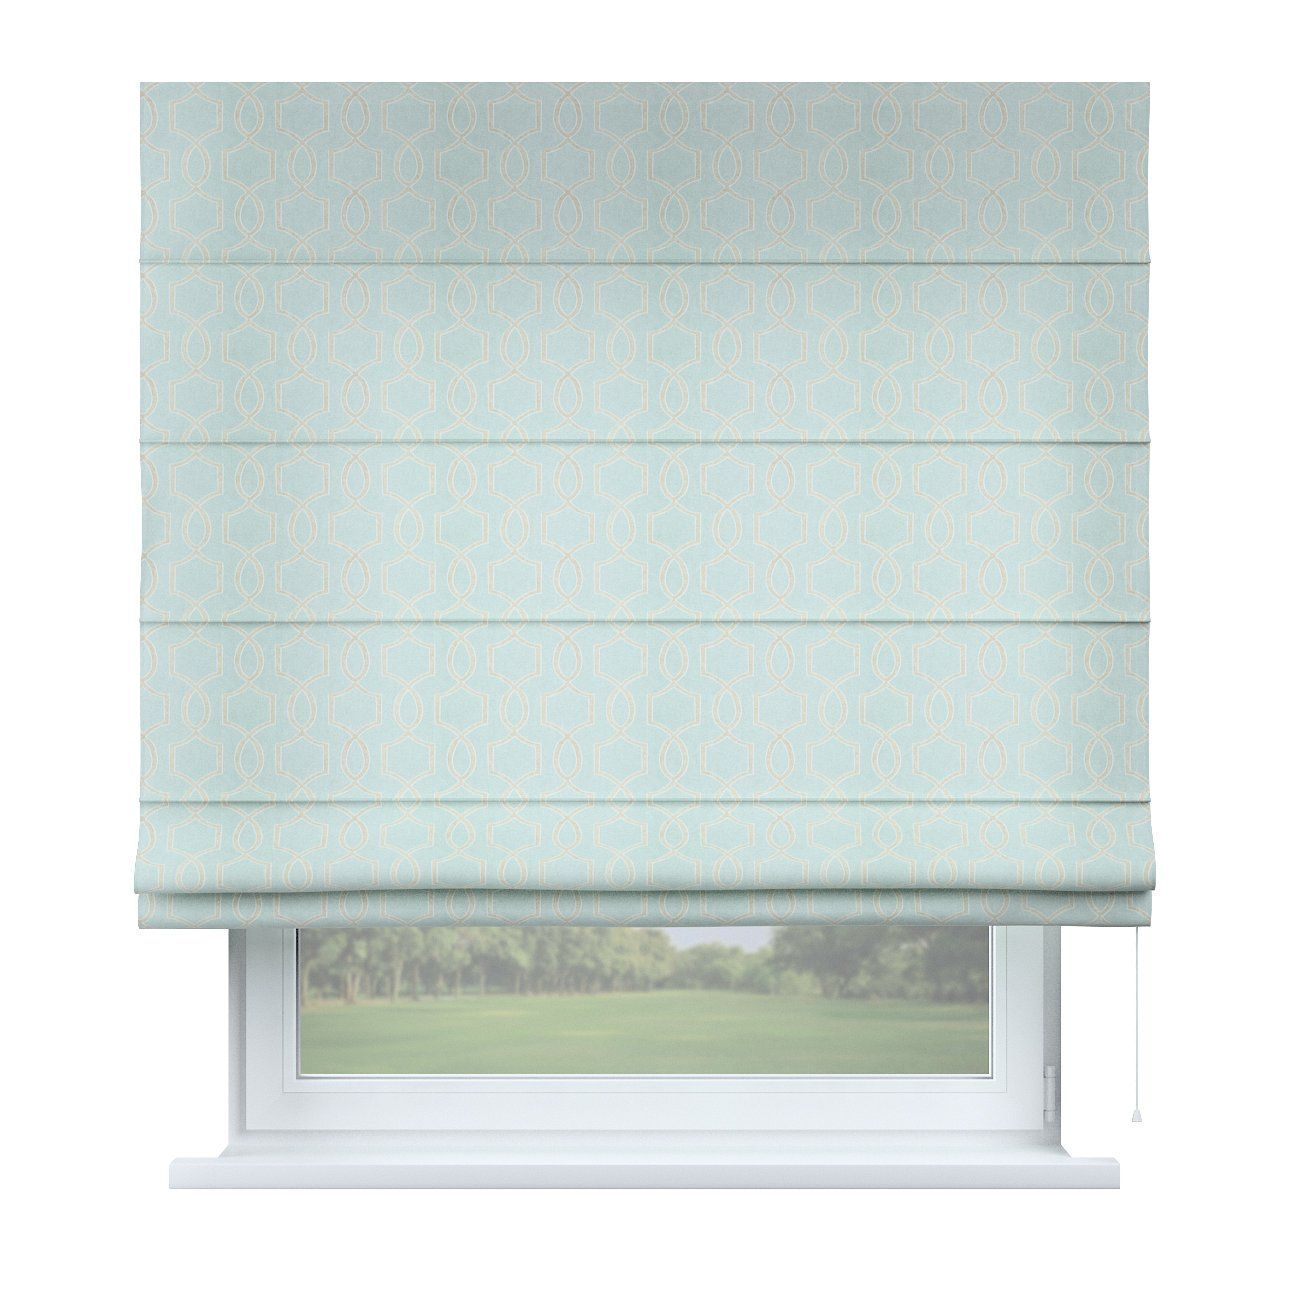 Jalousie 240 Cm Verdunkelungsrollo Fenster Innen Matchline